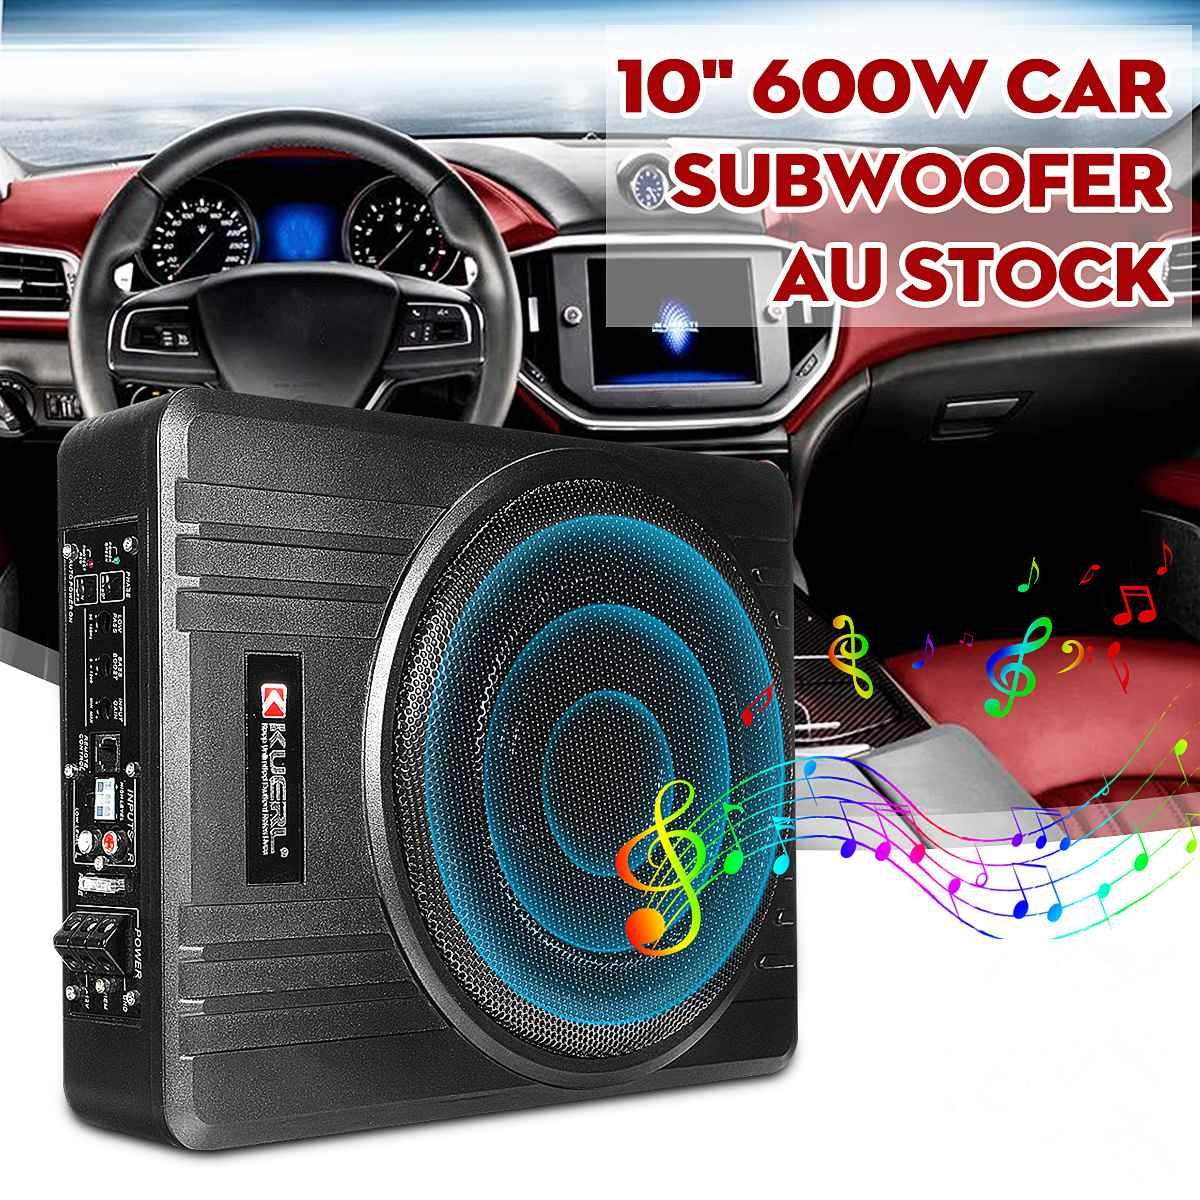 10 Inch 600W Auto Subwoofer Auto Audio Slanke Onder Seat Actieve Subwoofer Bass Versterker Luidspreker Auto Versterker Subwoofers Woofer